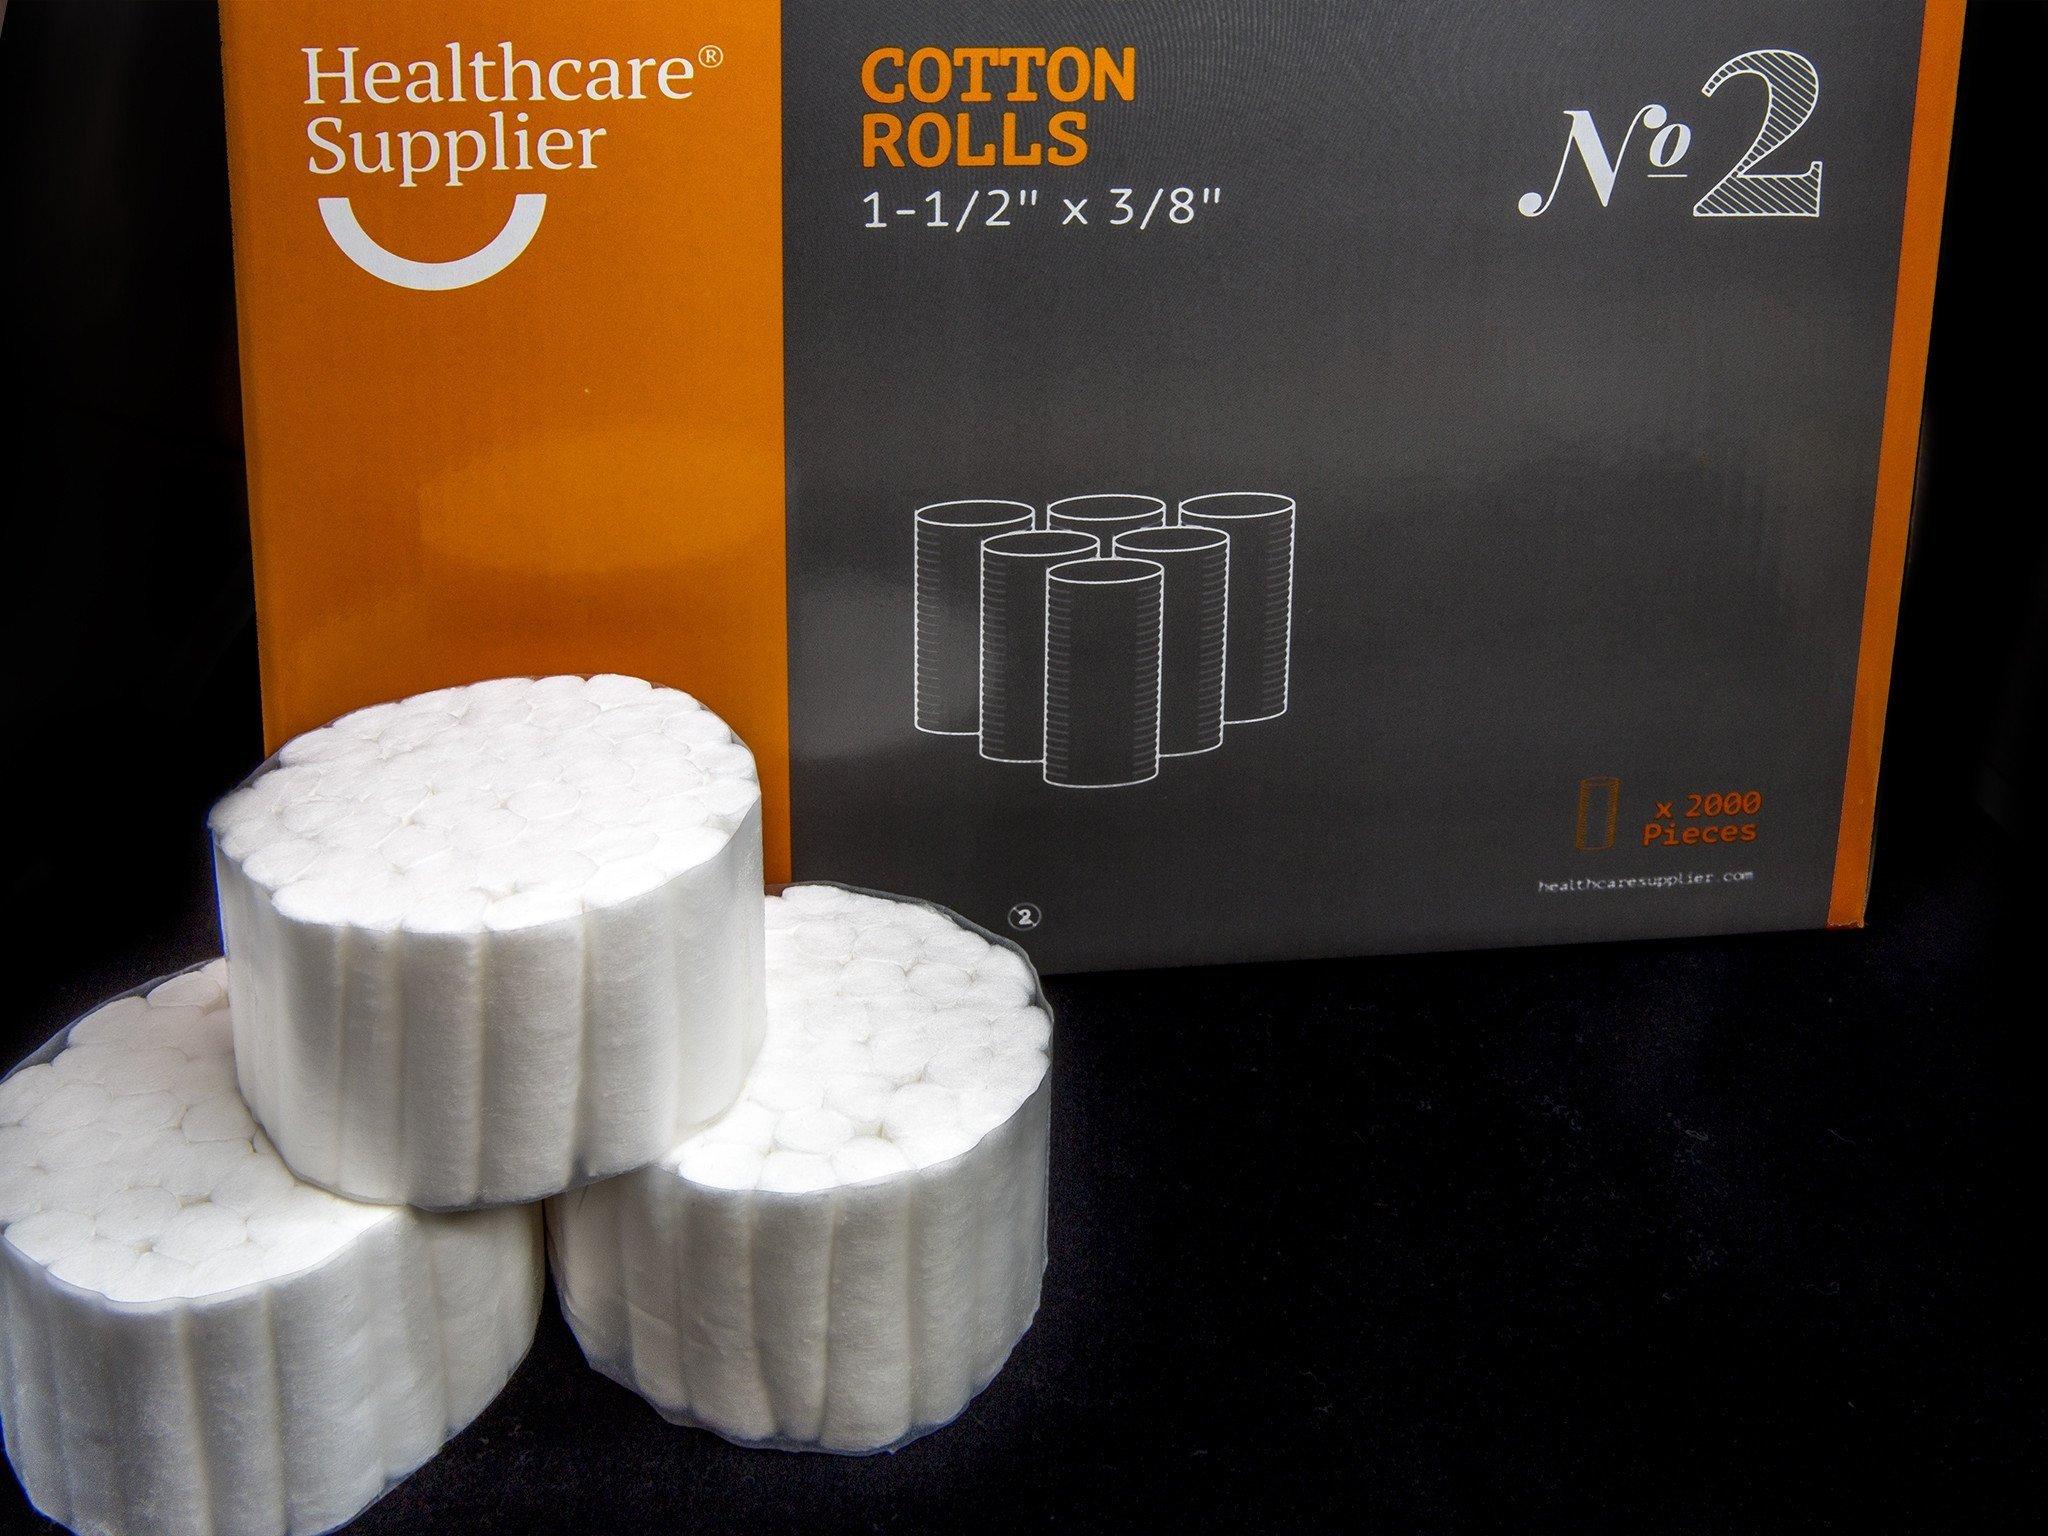 HEALTHCARE SUPPLIER Cotton Dental Rolls Size 2 (2000 Count) Professional Dental Supplies